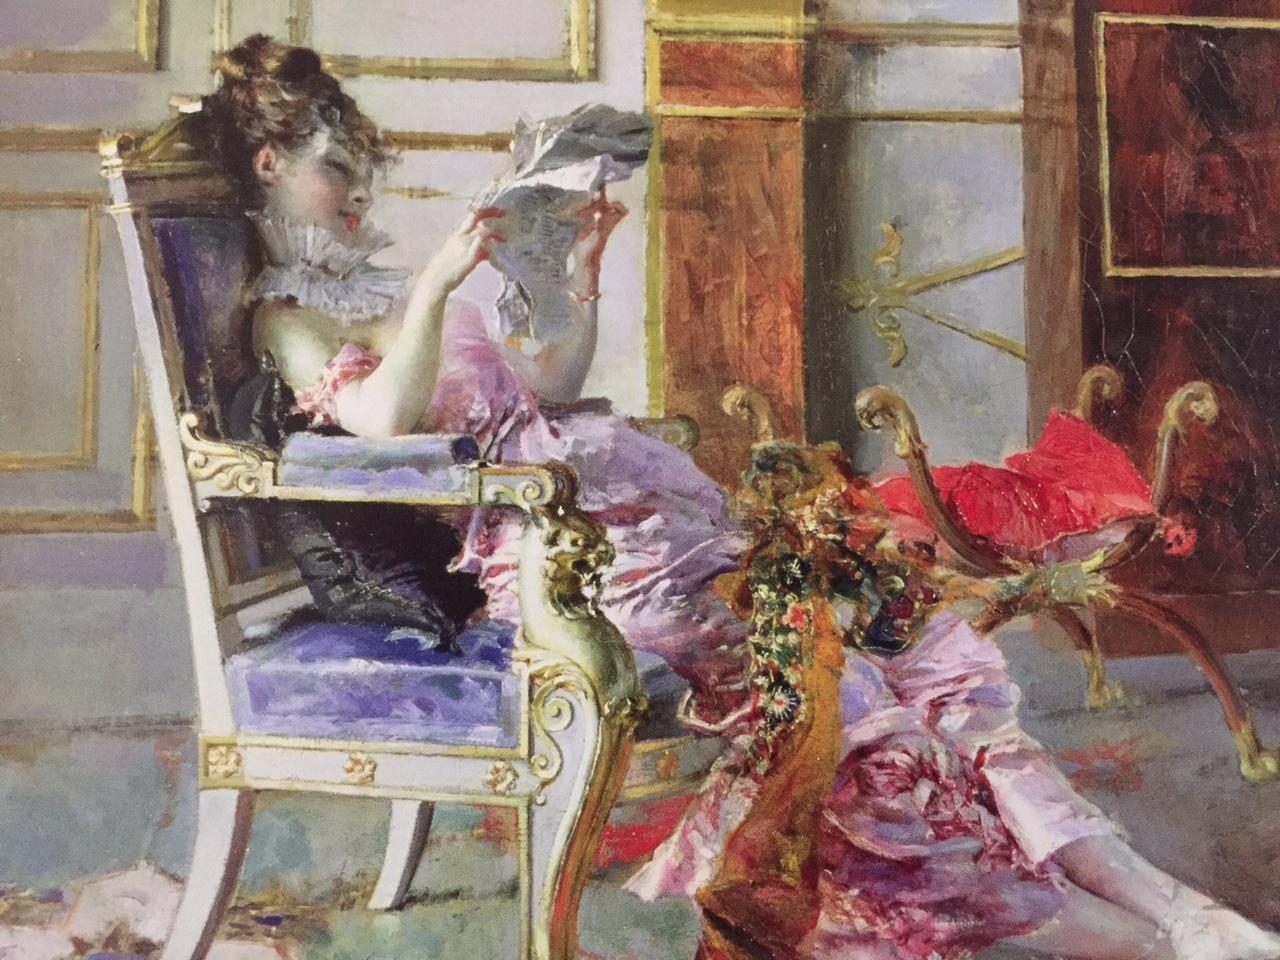 Woman luxuriates while reading